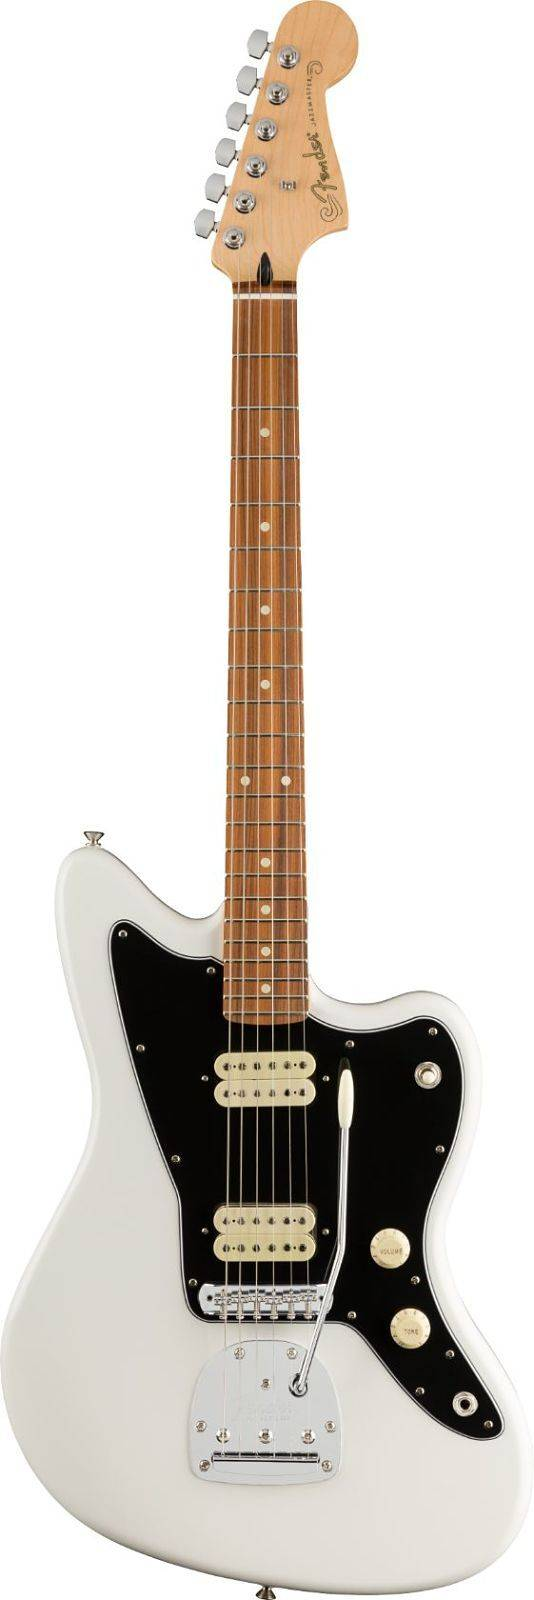 Guitarra Fender Player Jazzmaster Blanca